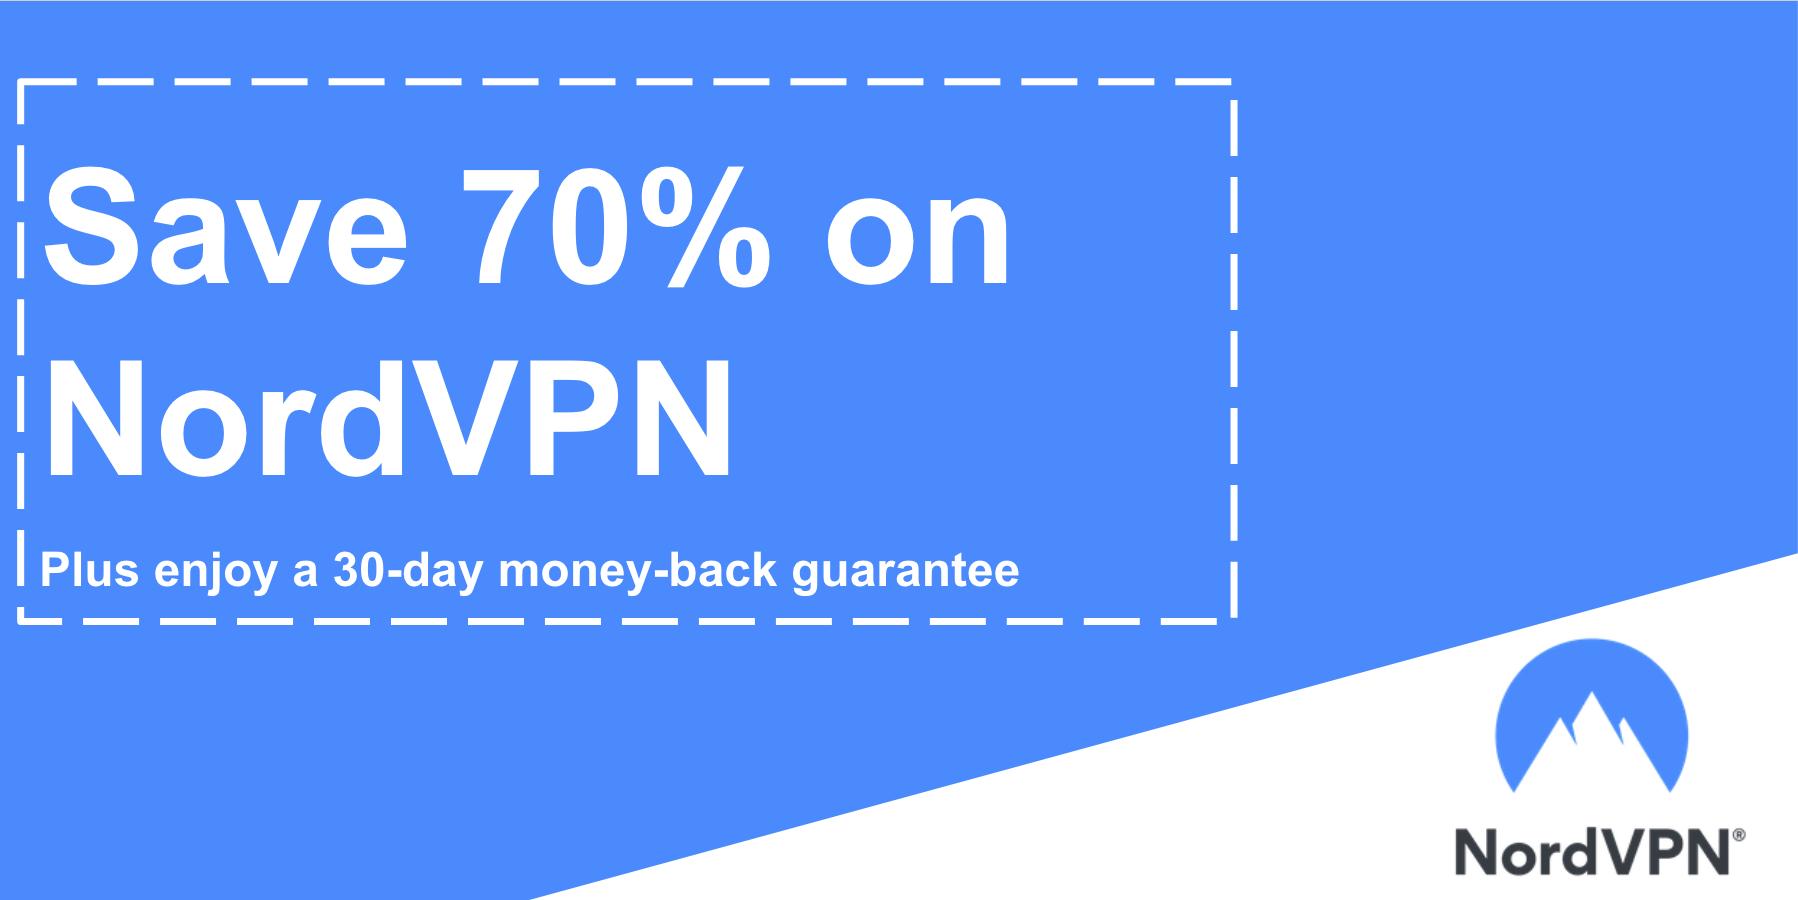 NordVPN Coupon 70 Discount